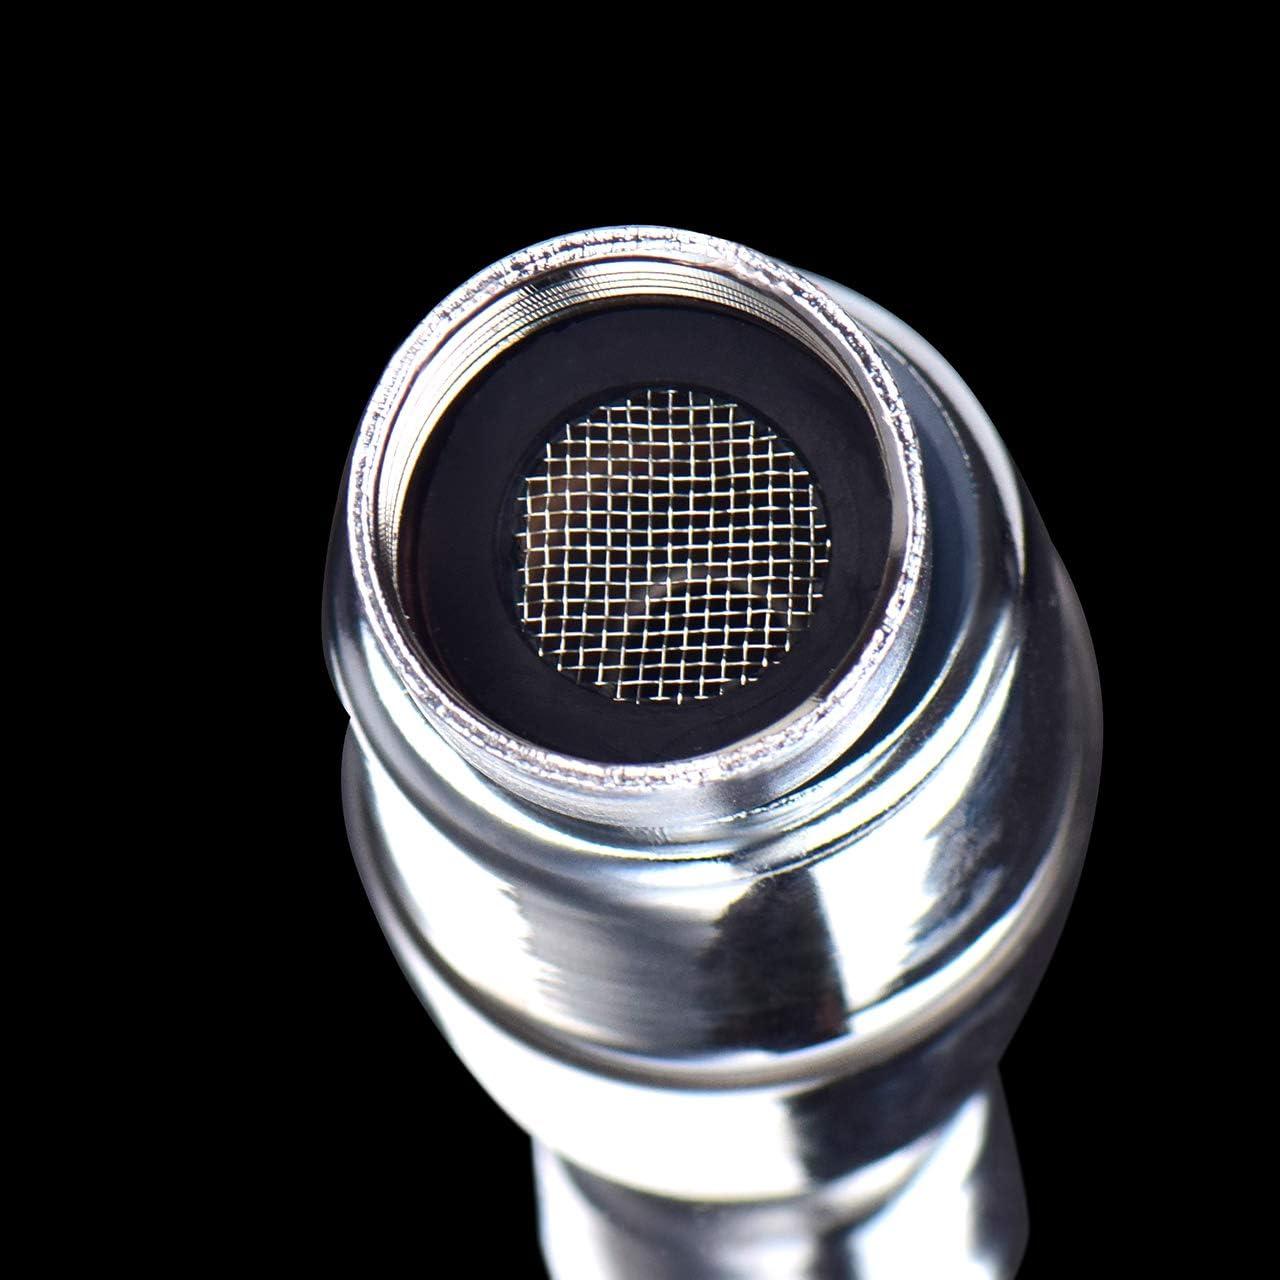 10 Inch 304 Stainless Steel Rainfall Showerhead Renxinu 1 Pack High Pressure Shower Head Ultra-Thin Design-Best Pressure Boosting for Bathroom